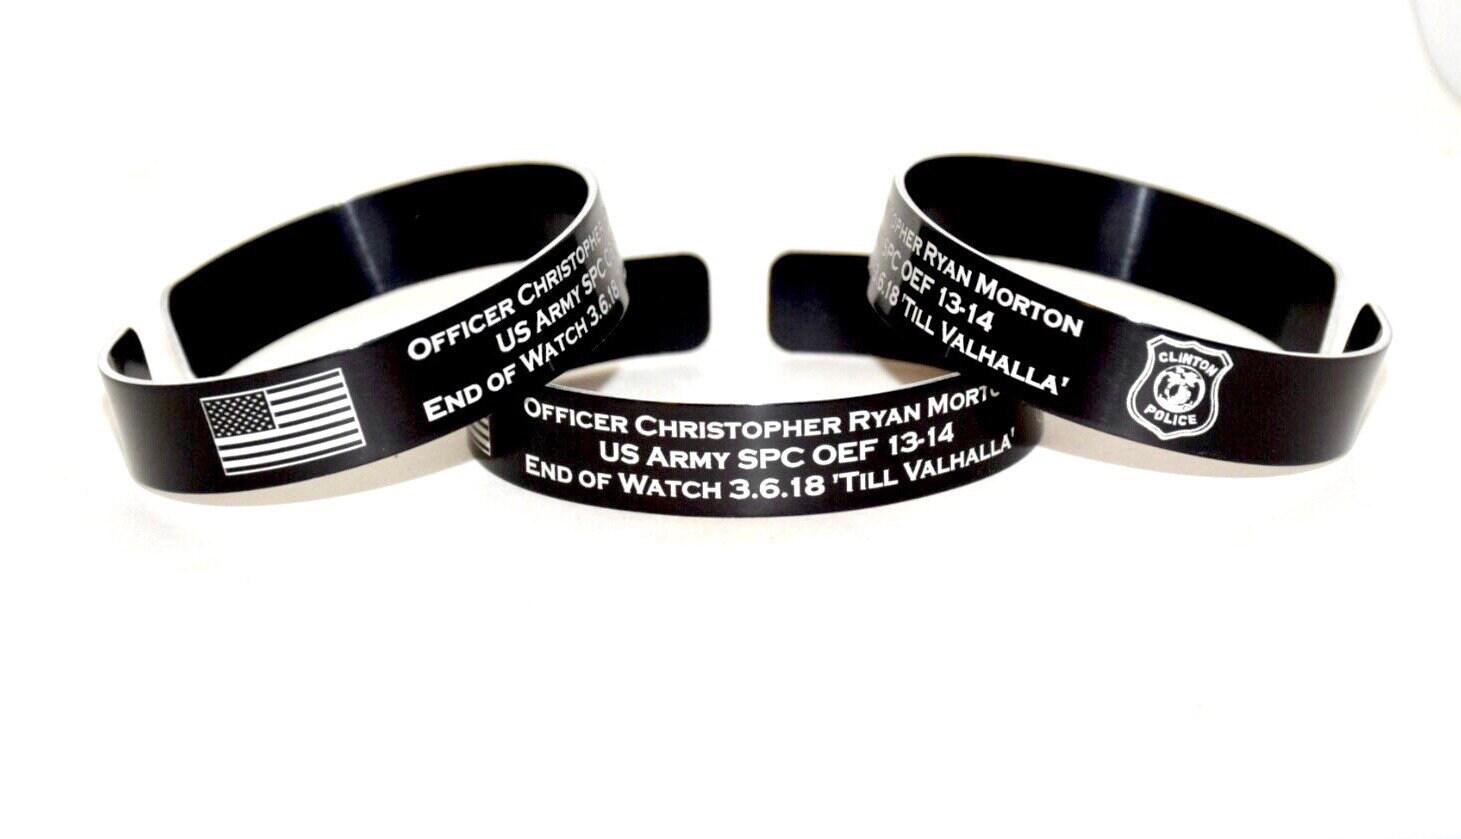 fallen delta msgt bracelet brrssbah gary shughart army forces special bracelets hero sfod us sfc kia gordon randall